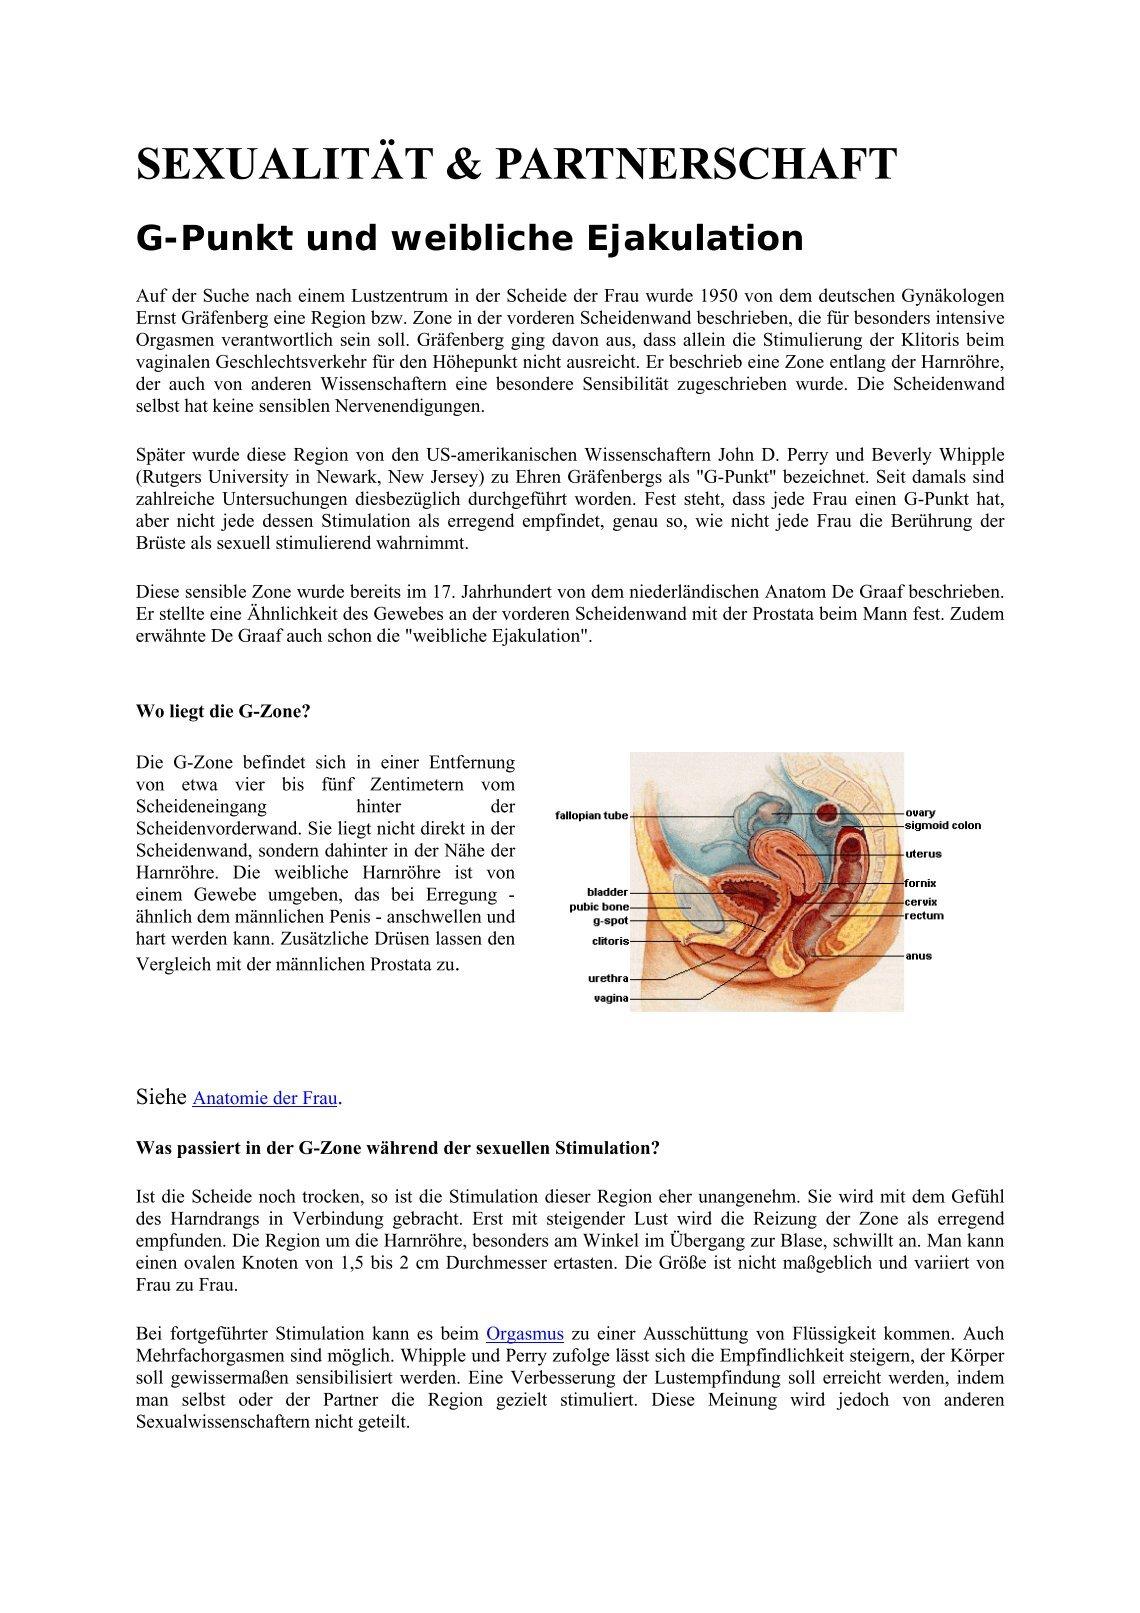 ejakulationsstimulering